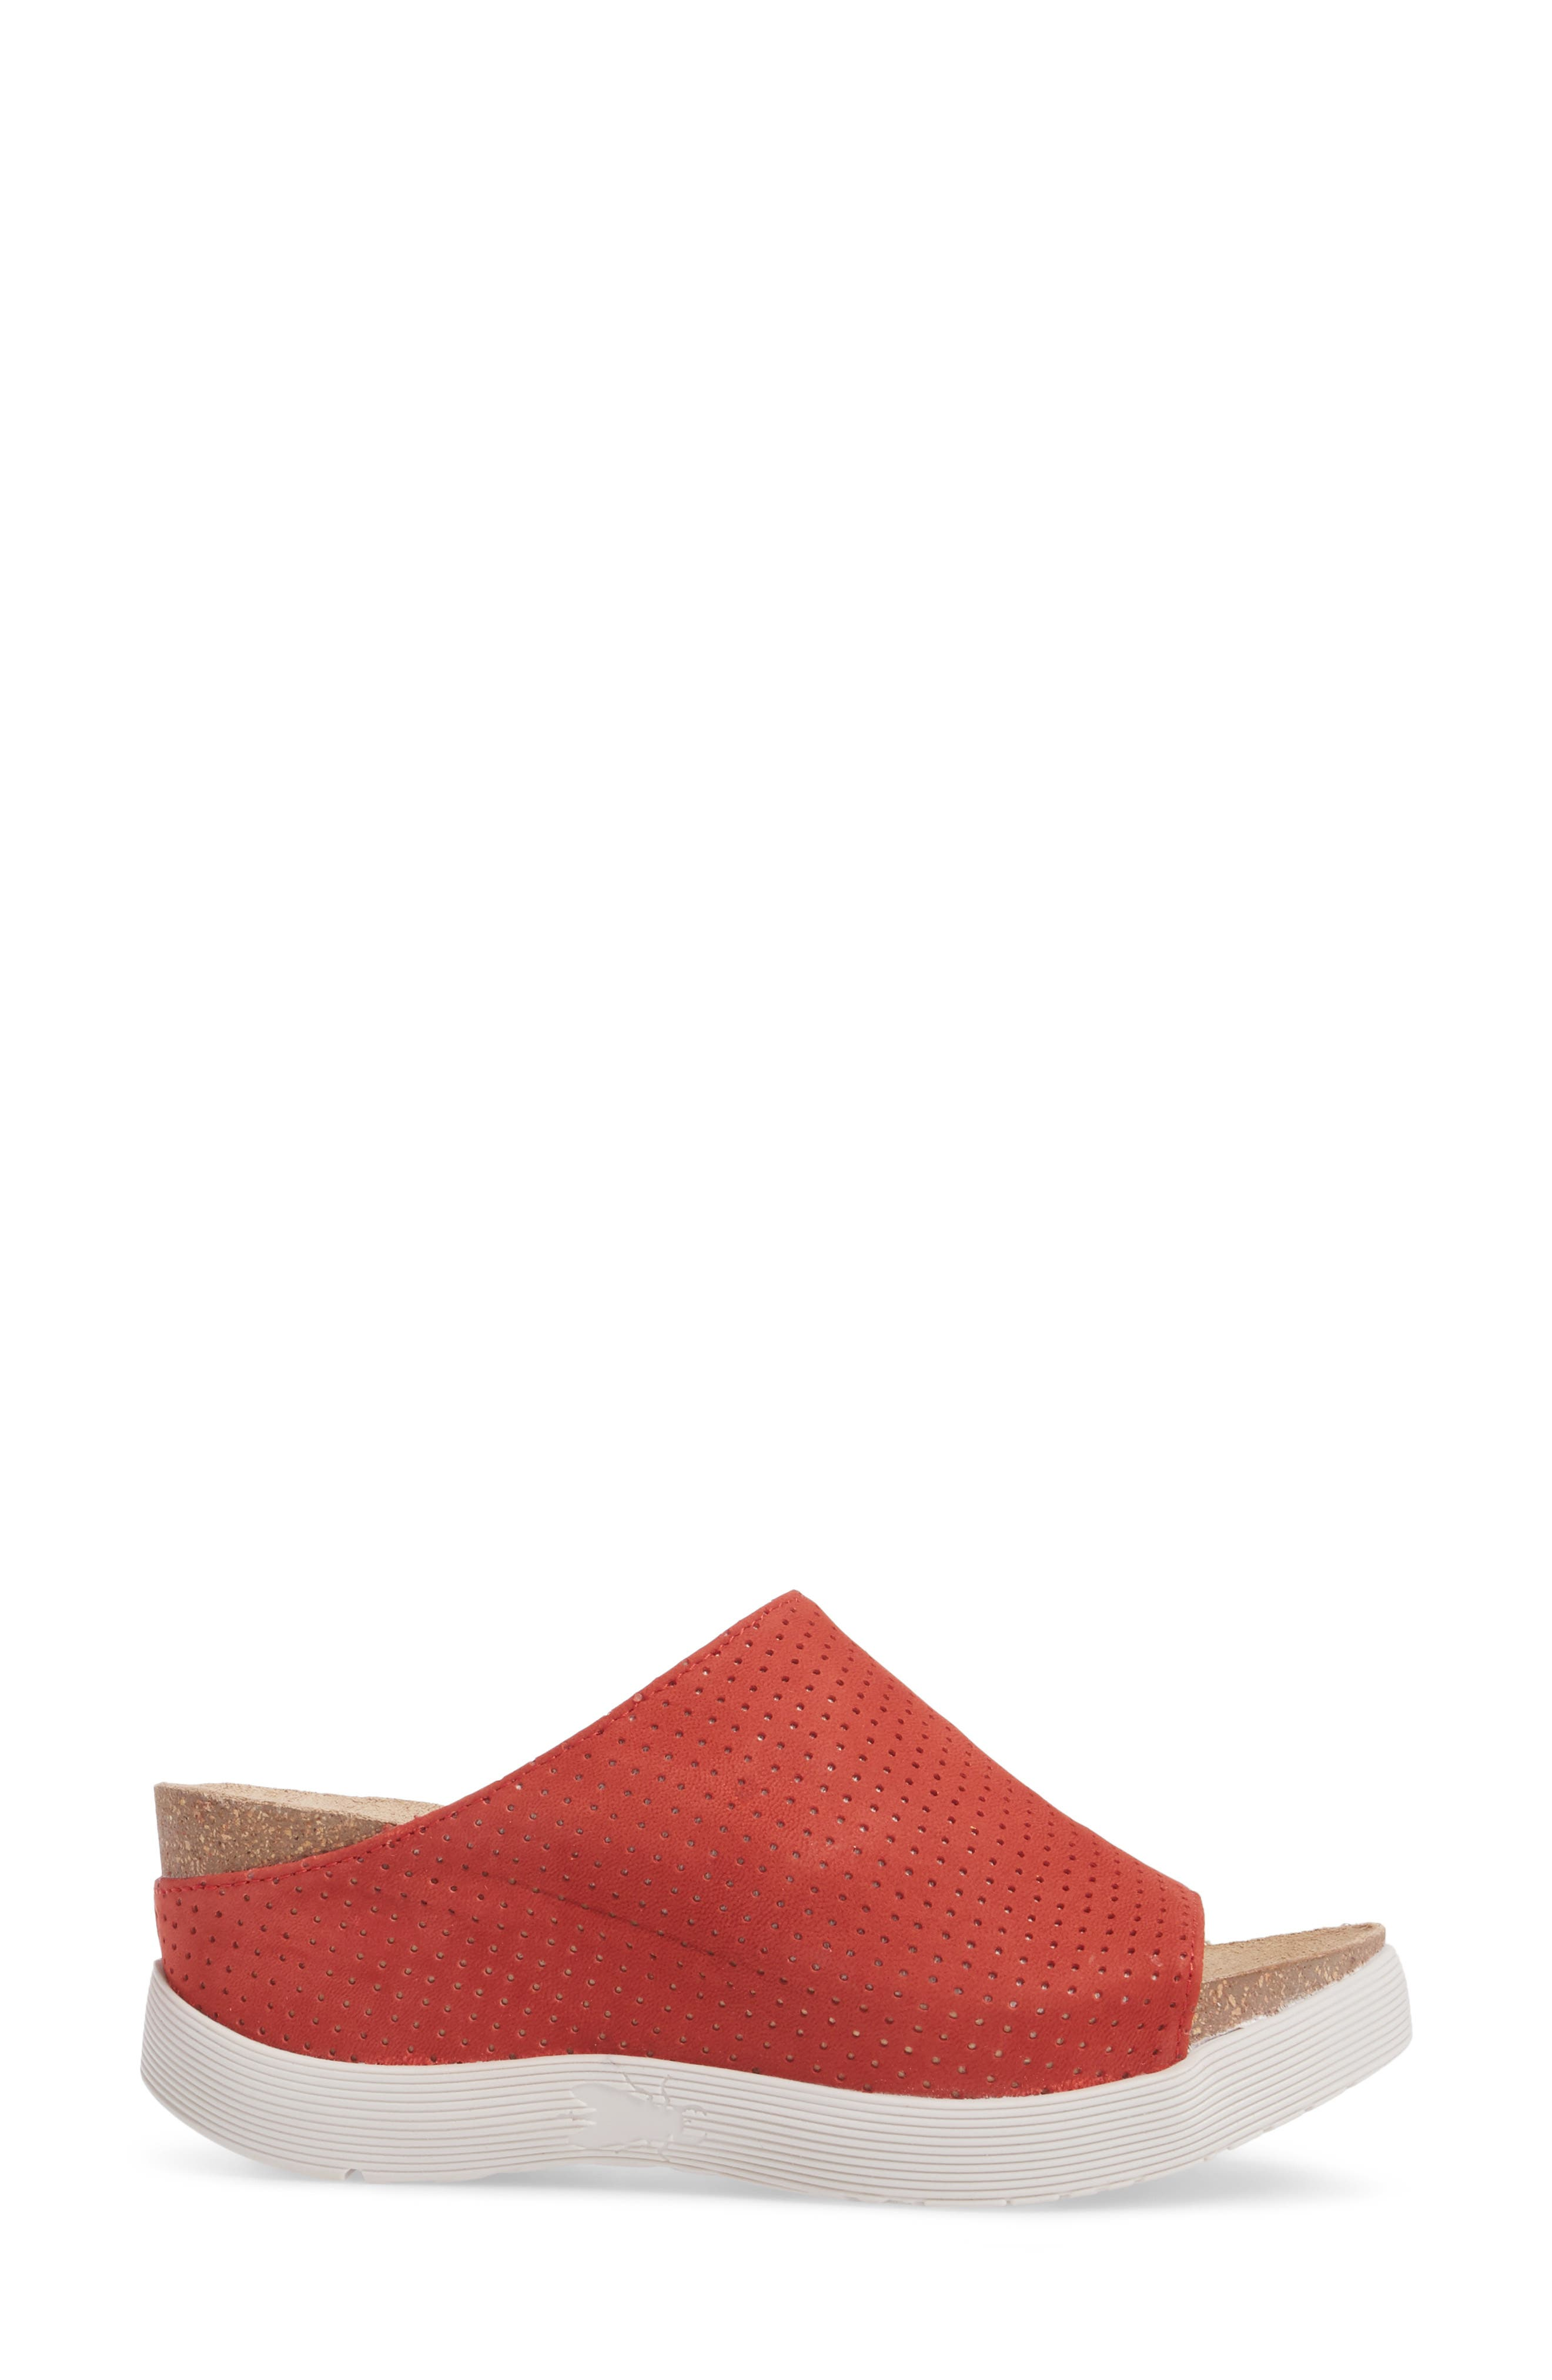 Whin Platform Sandal,                             Alternate thumbnail 3, color,                             Scarlet Cupido Leather